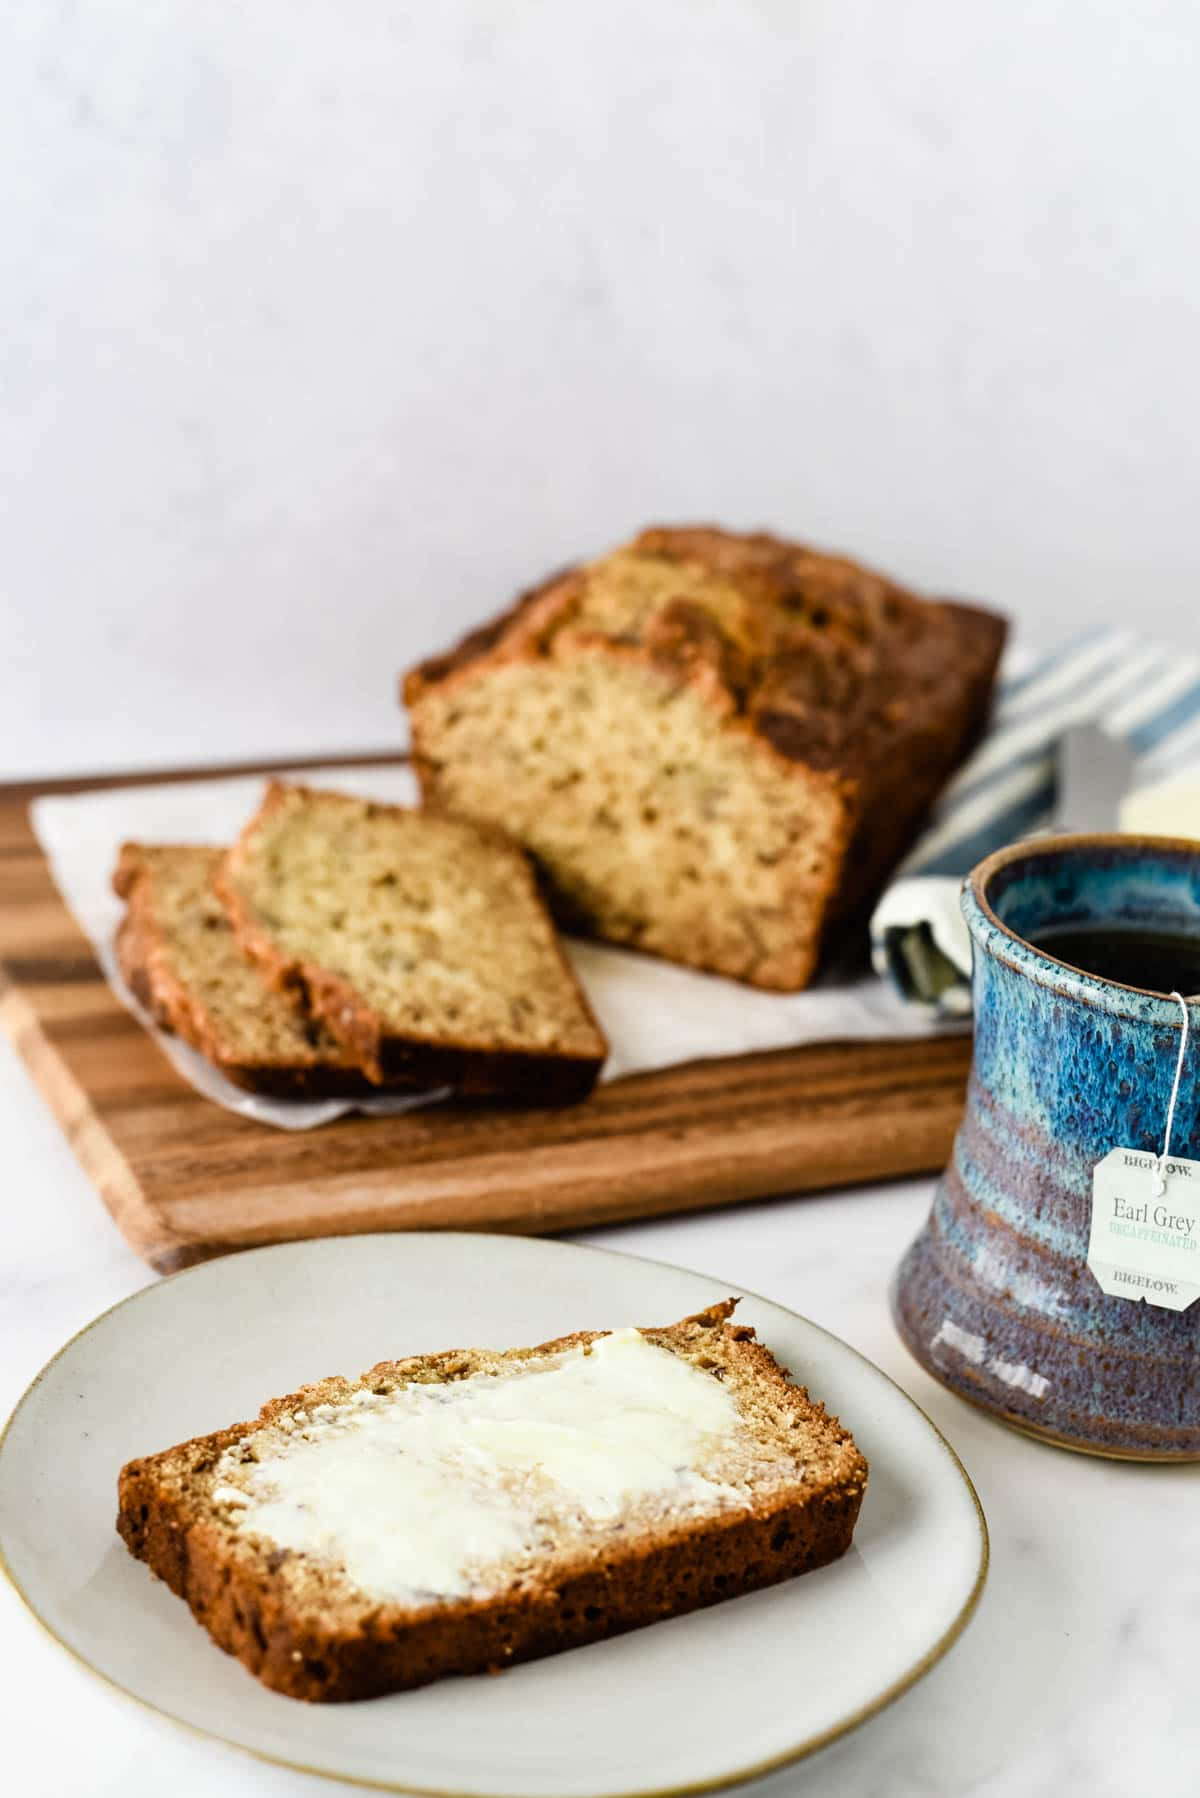 slice of tea cake on plate next to mug and loaf